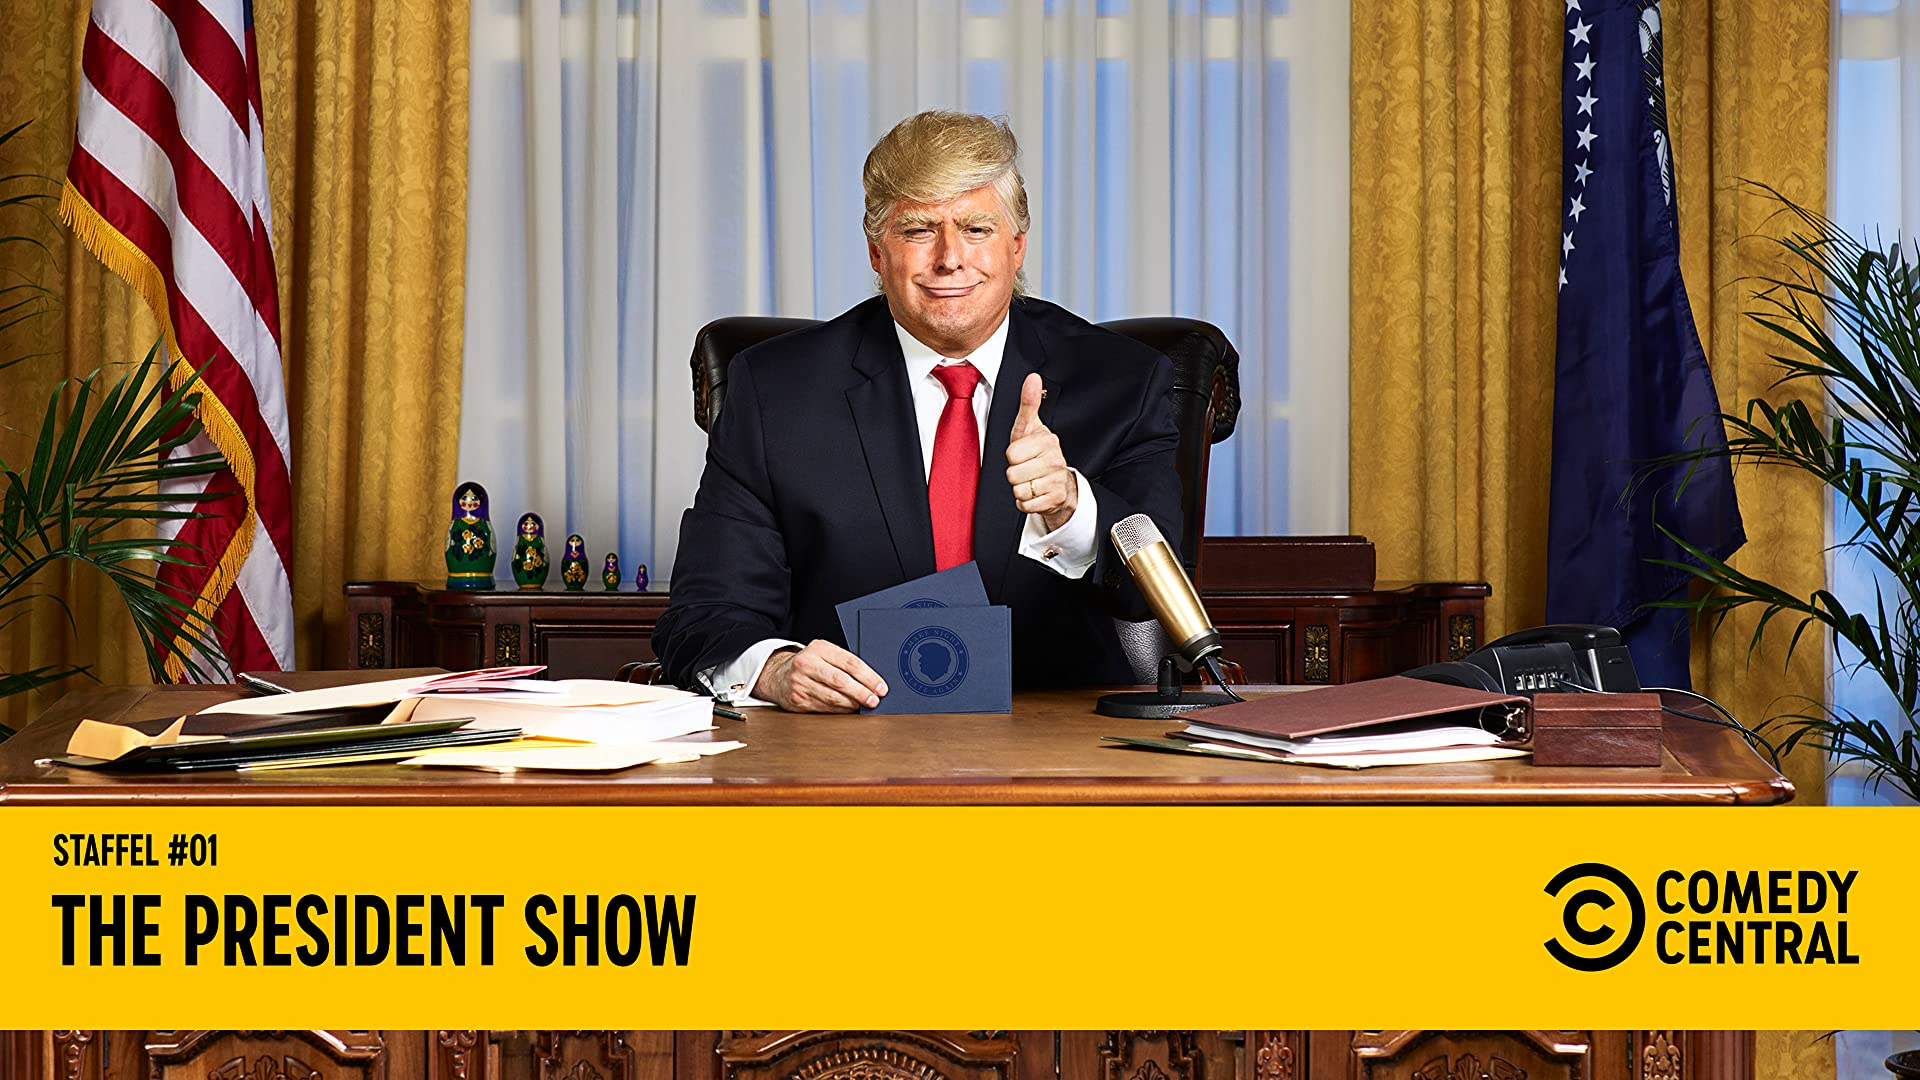 The President Show Staffel 1